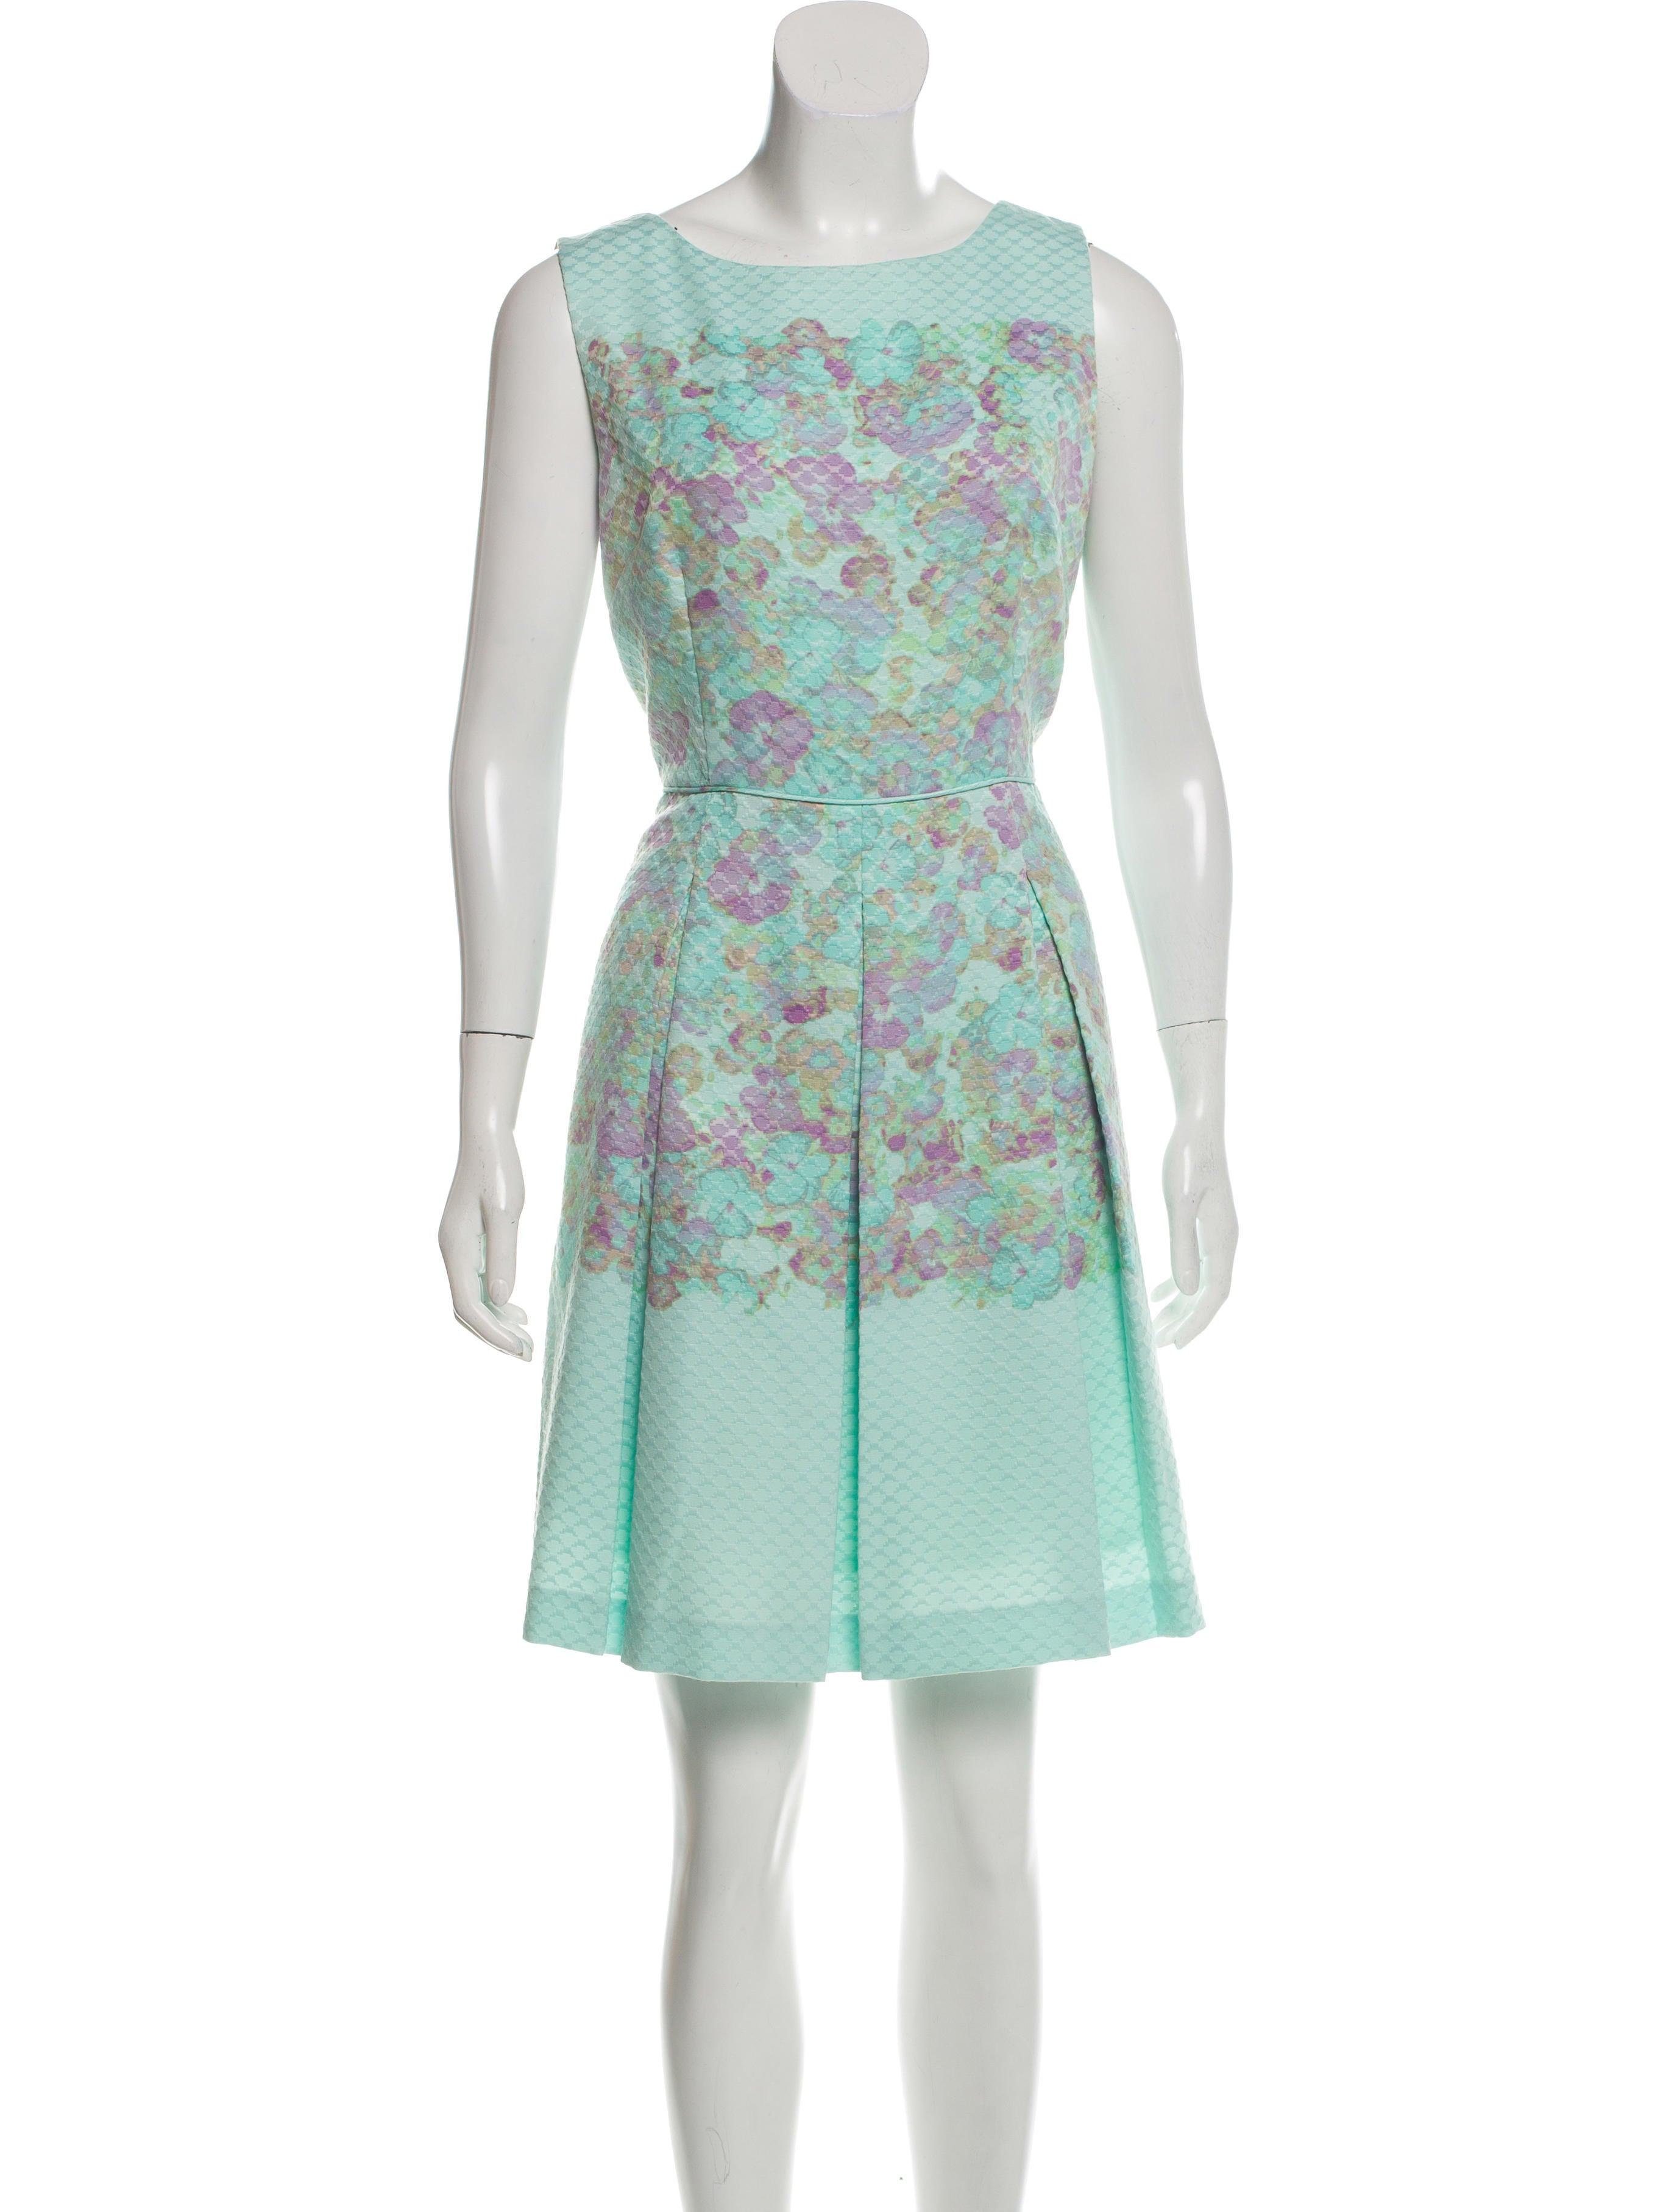 ffe7da54b7c2 Tahari Arthur S. Levine Embroidered Floral Dress - Clothing ...